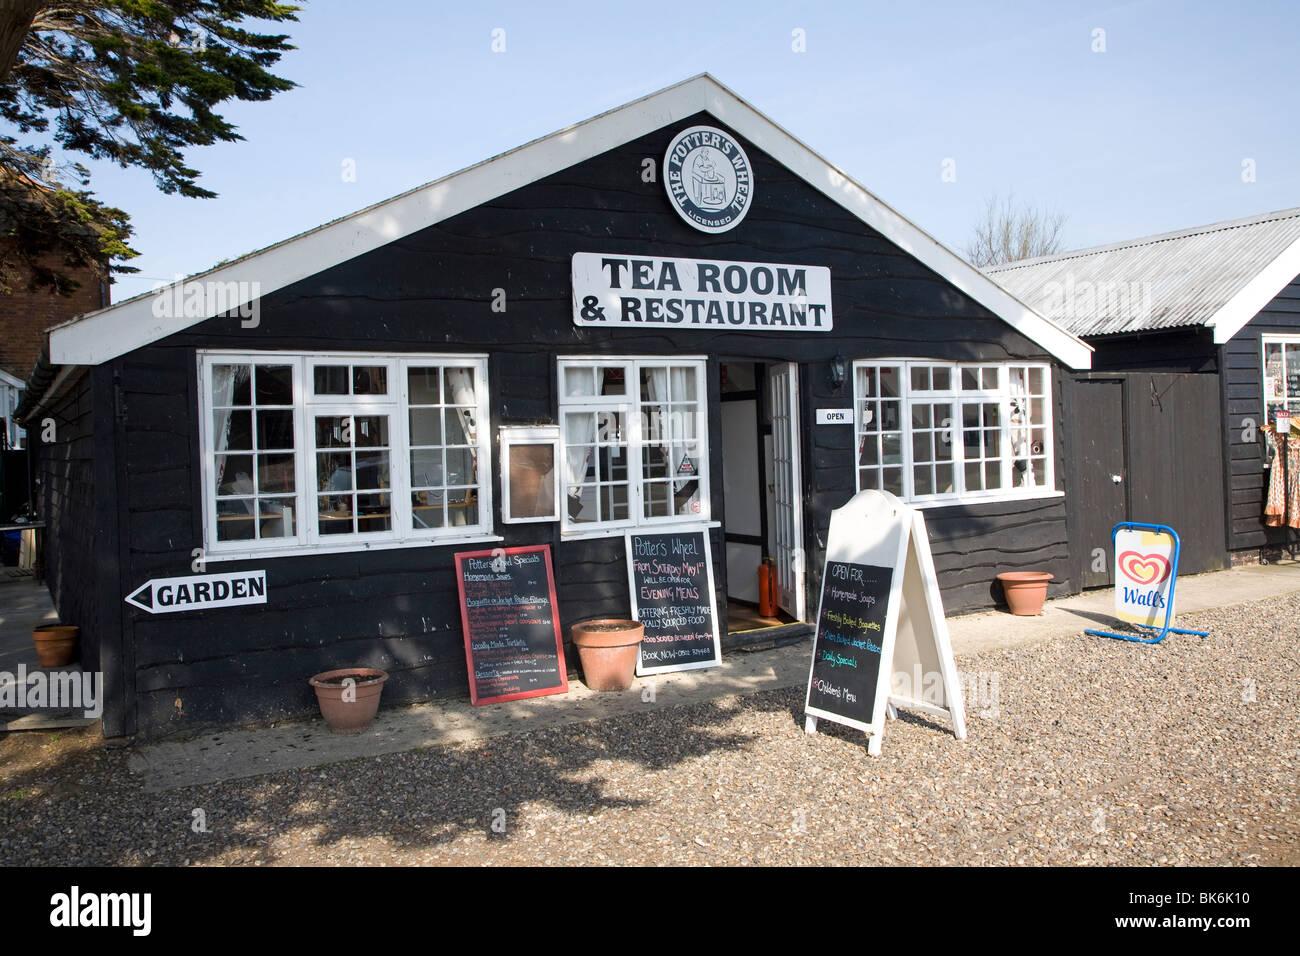 Tea Room and restaurant Walberswick, Suffolk - Stock Image